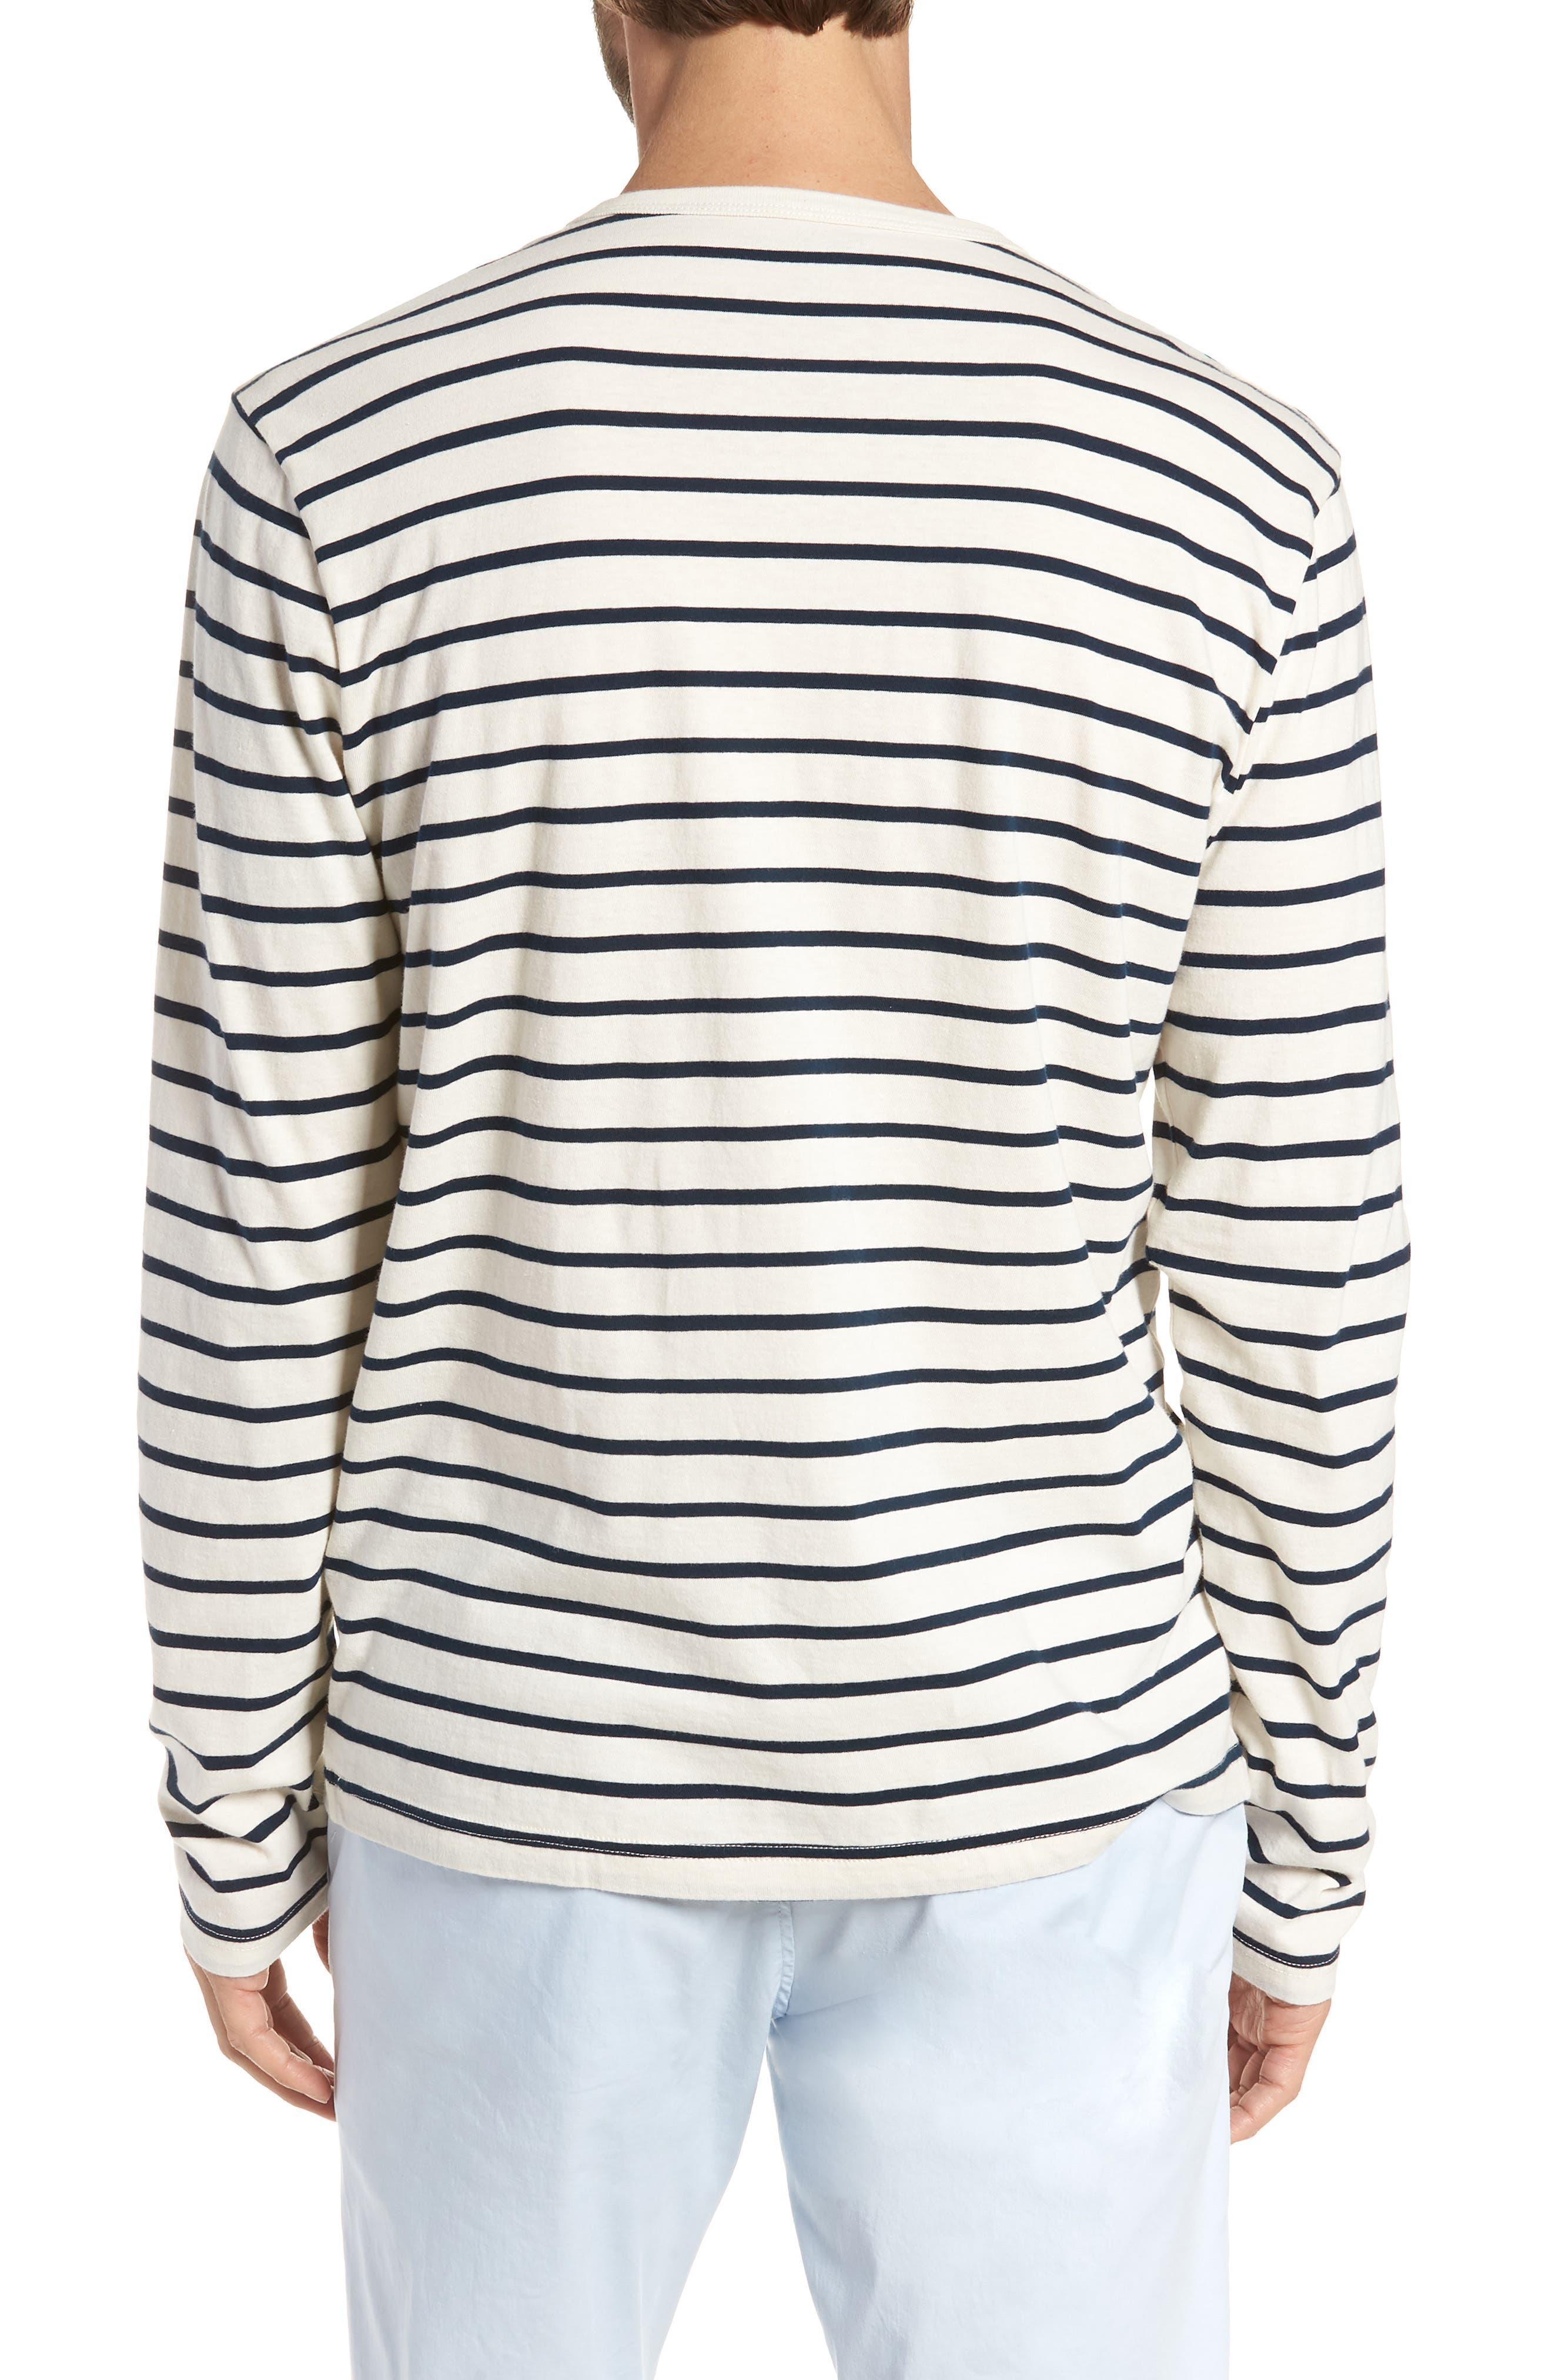 Mercantile Stripe Long Sleeve T-Shirt,                             Alternate thumbnail 2, color,                             100